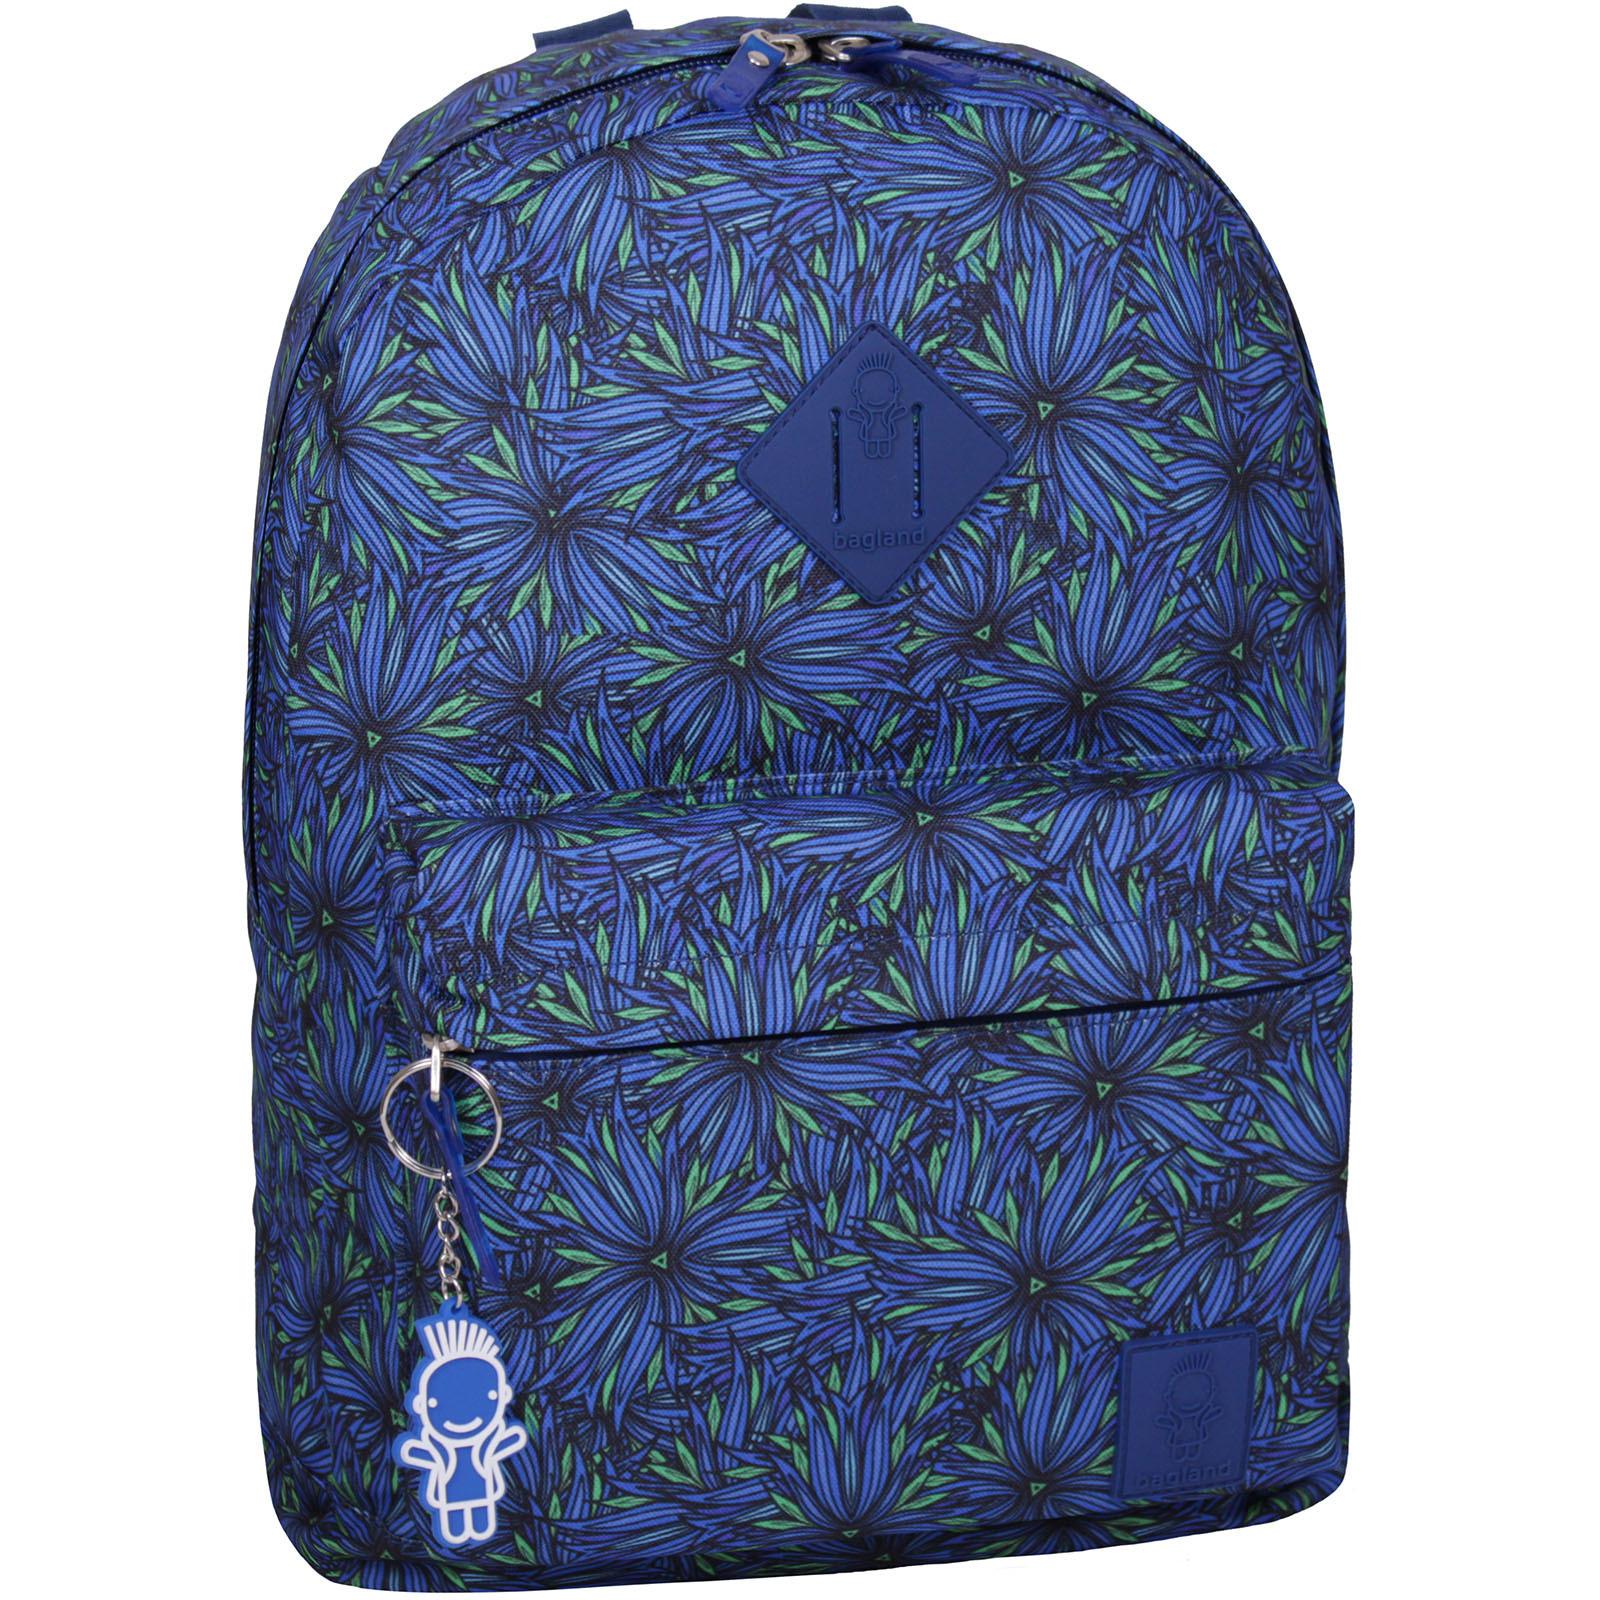 Городские рюкзаки Рюкзак Bagland Молодежный (дизайн) 17 л. сублимация (40) (00533664) IMG_3730.JPG